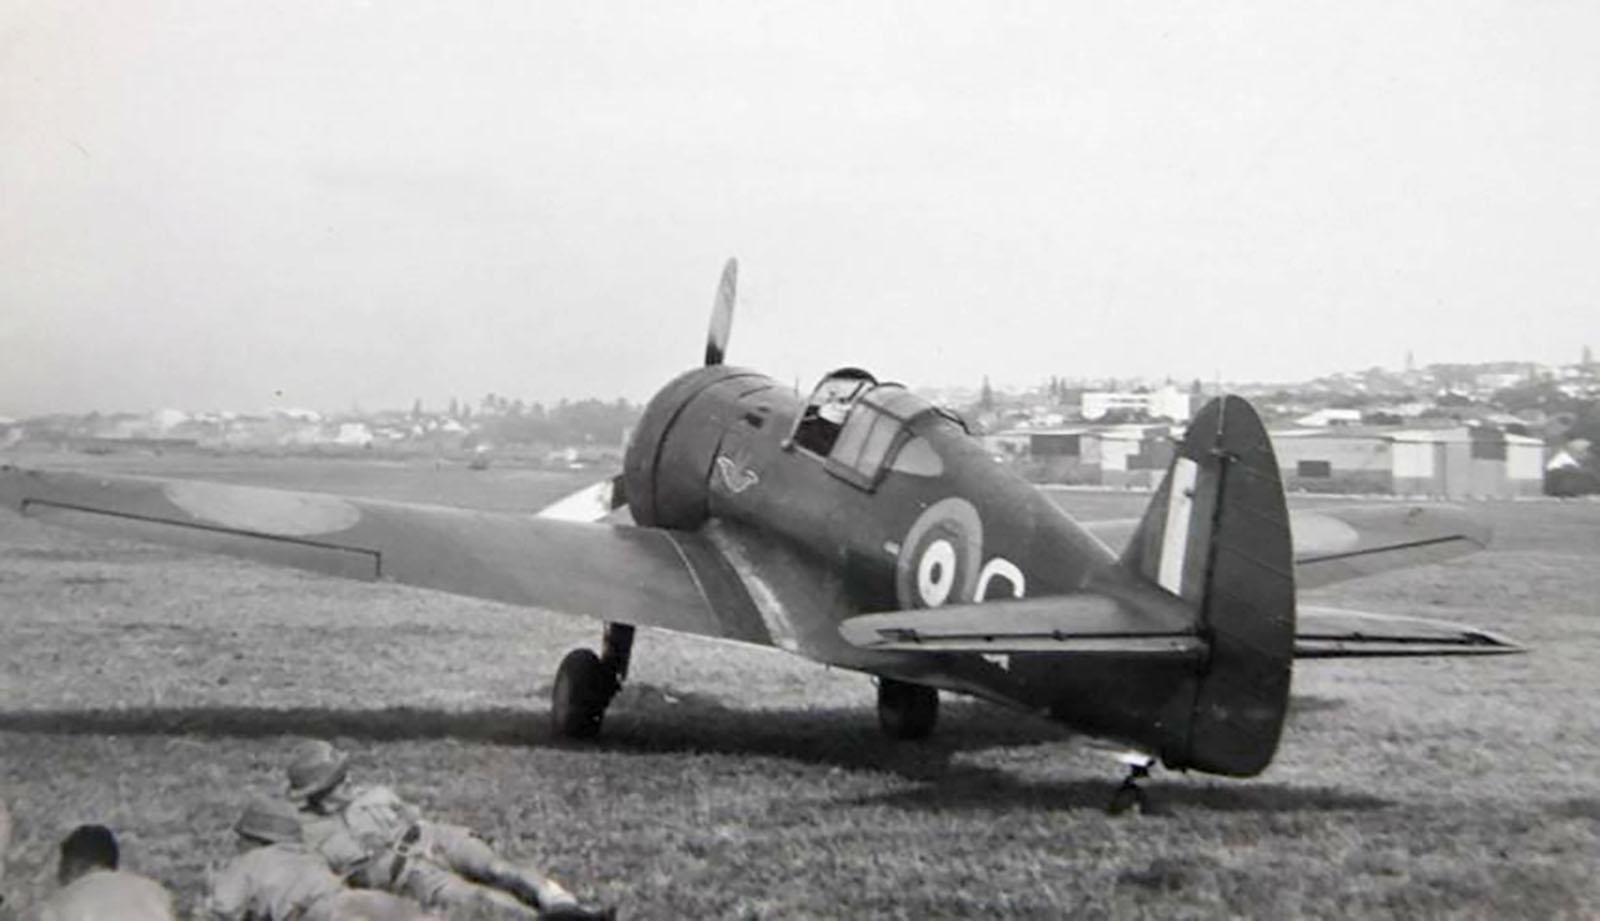 Mohawk IV SAAF 6Sqn White G Durban South Africa April 1942 01.jpg